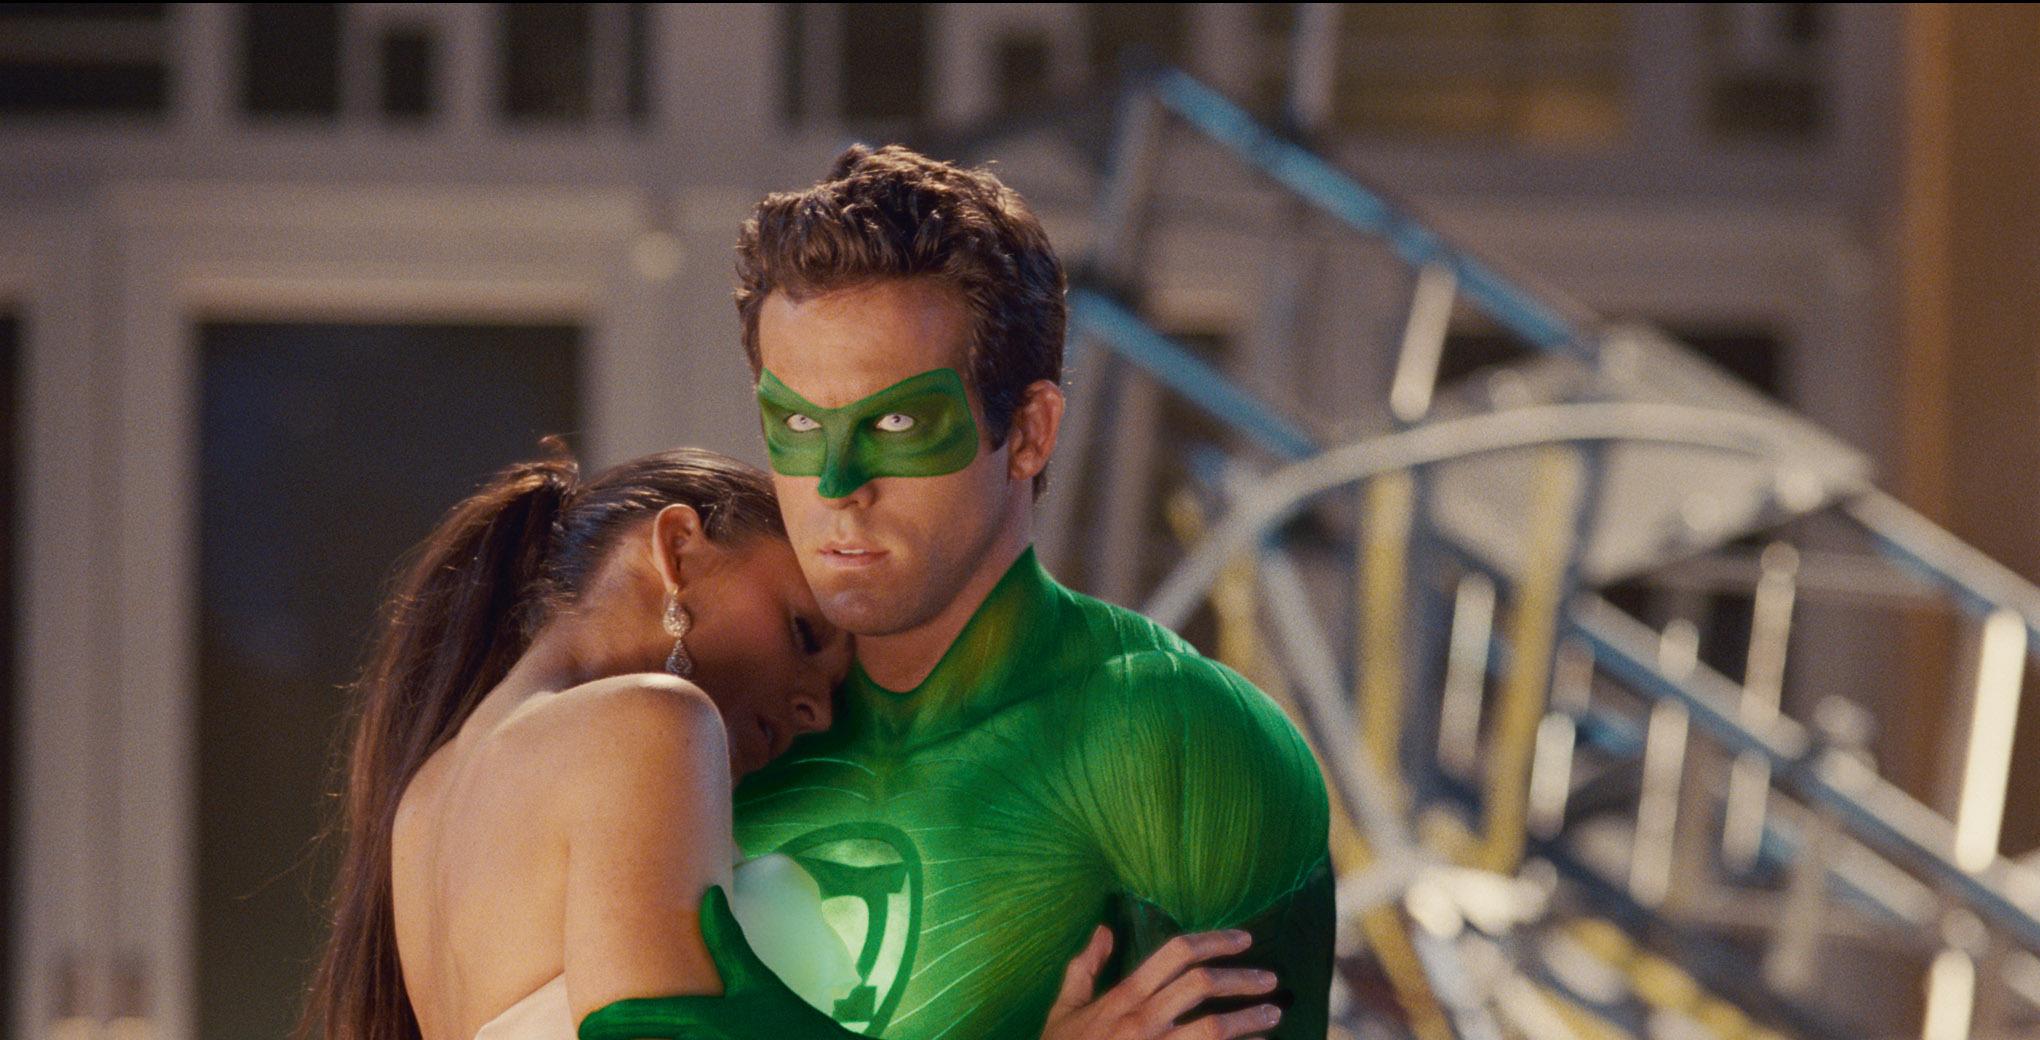 Ryan Reynolds and Blake Lively in Green Lantern (2011)